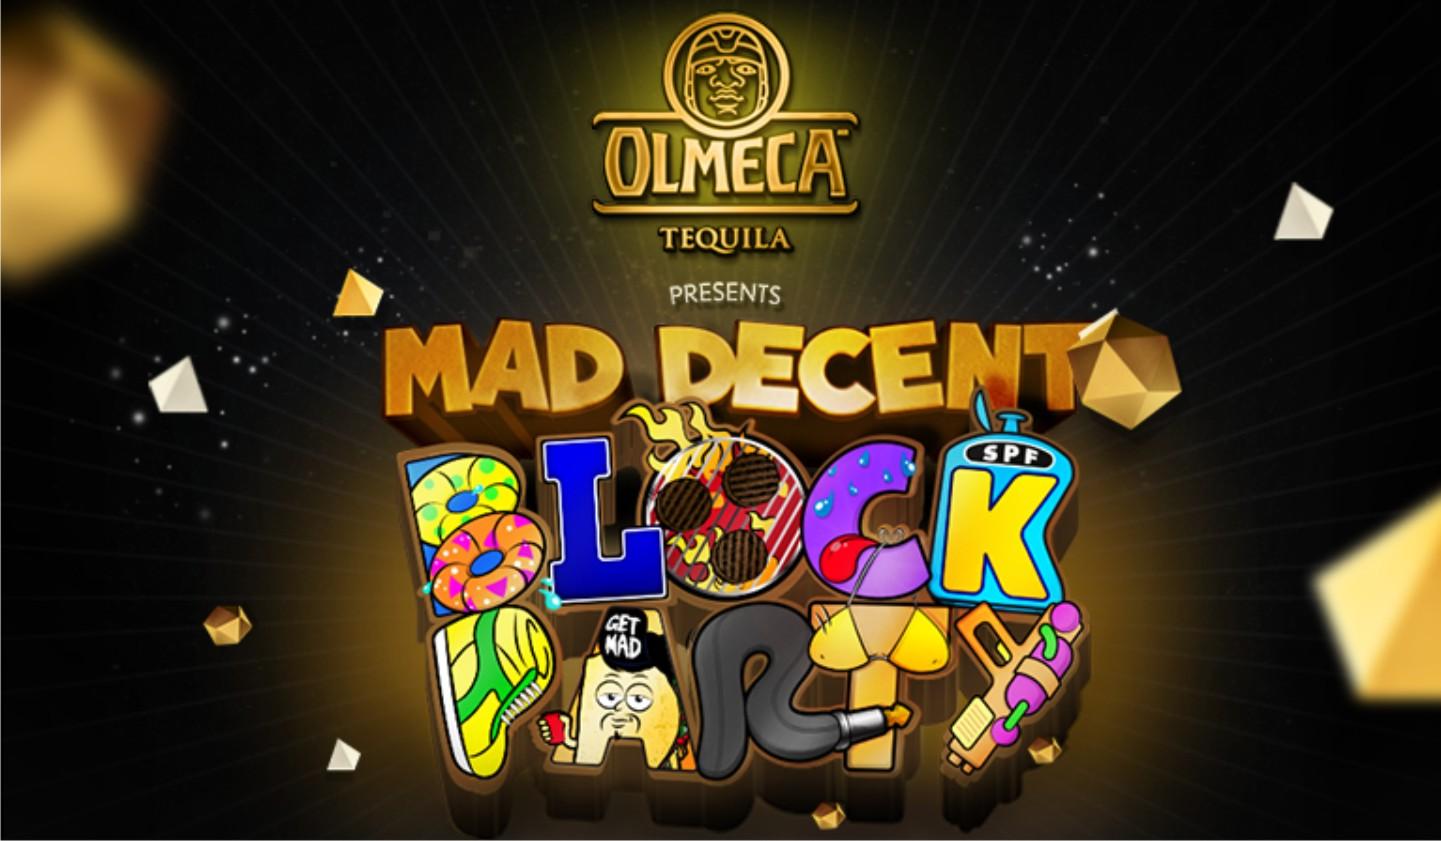 Olmeca Tequila presents Mad Decent Block Party